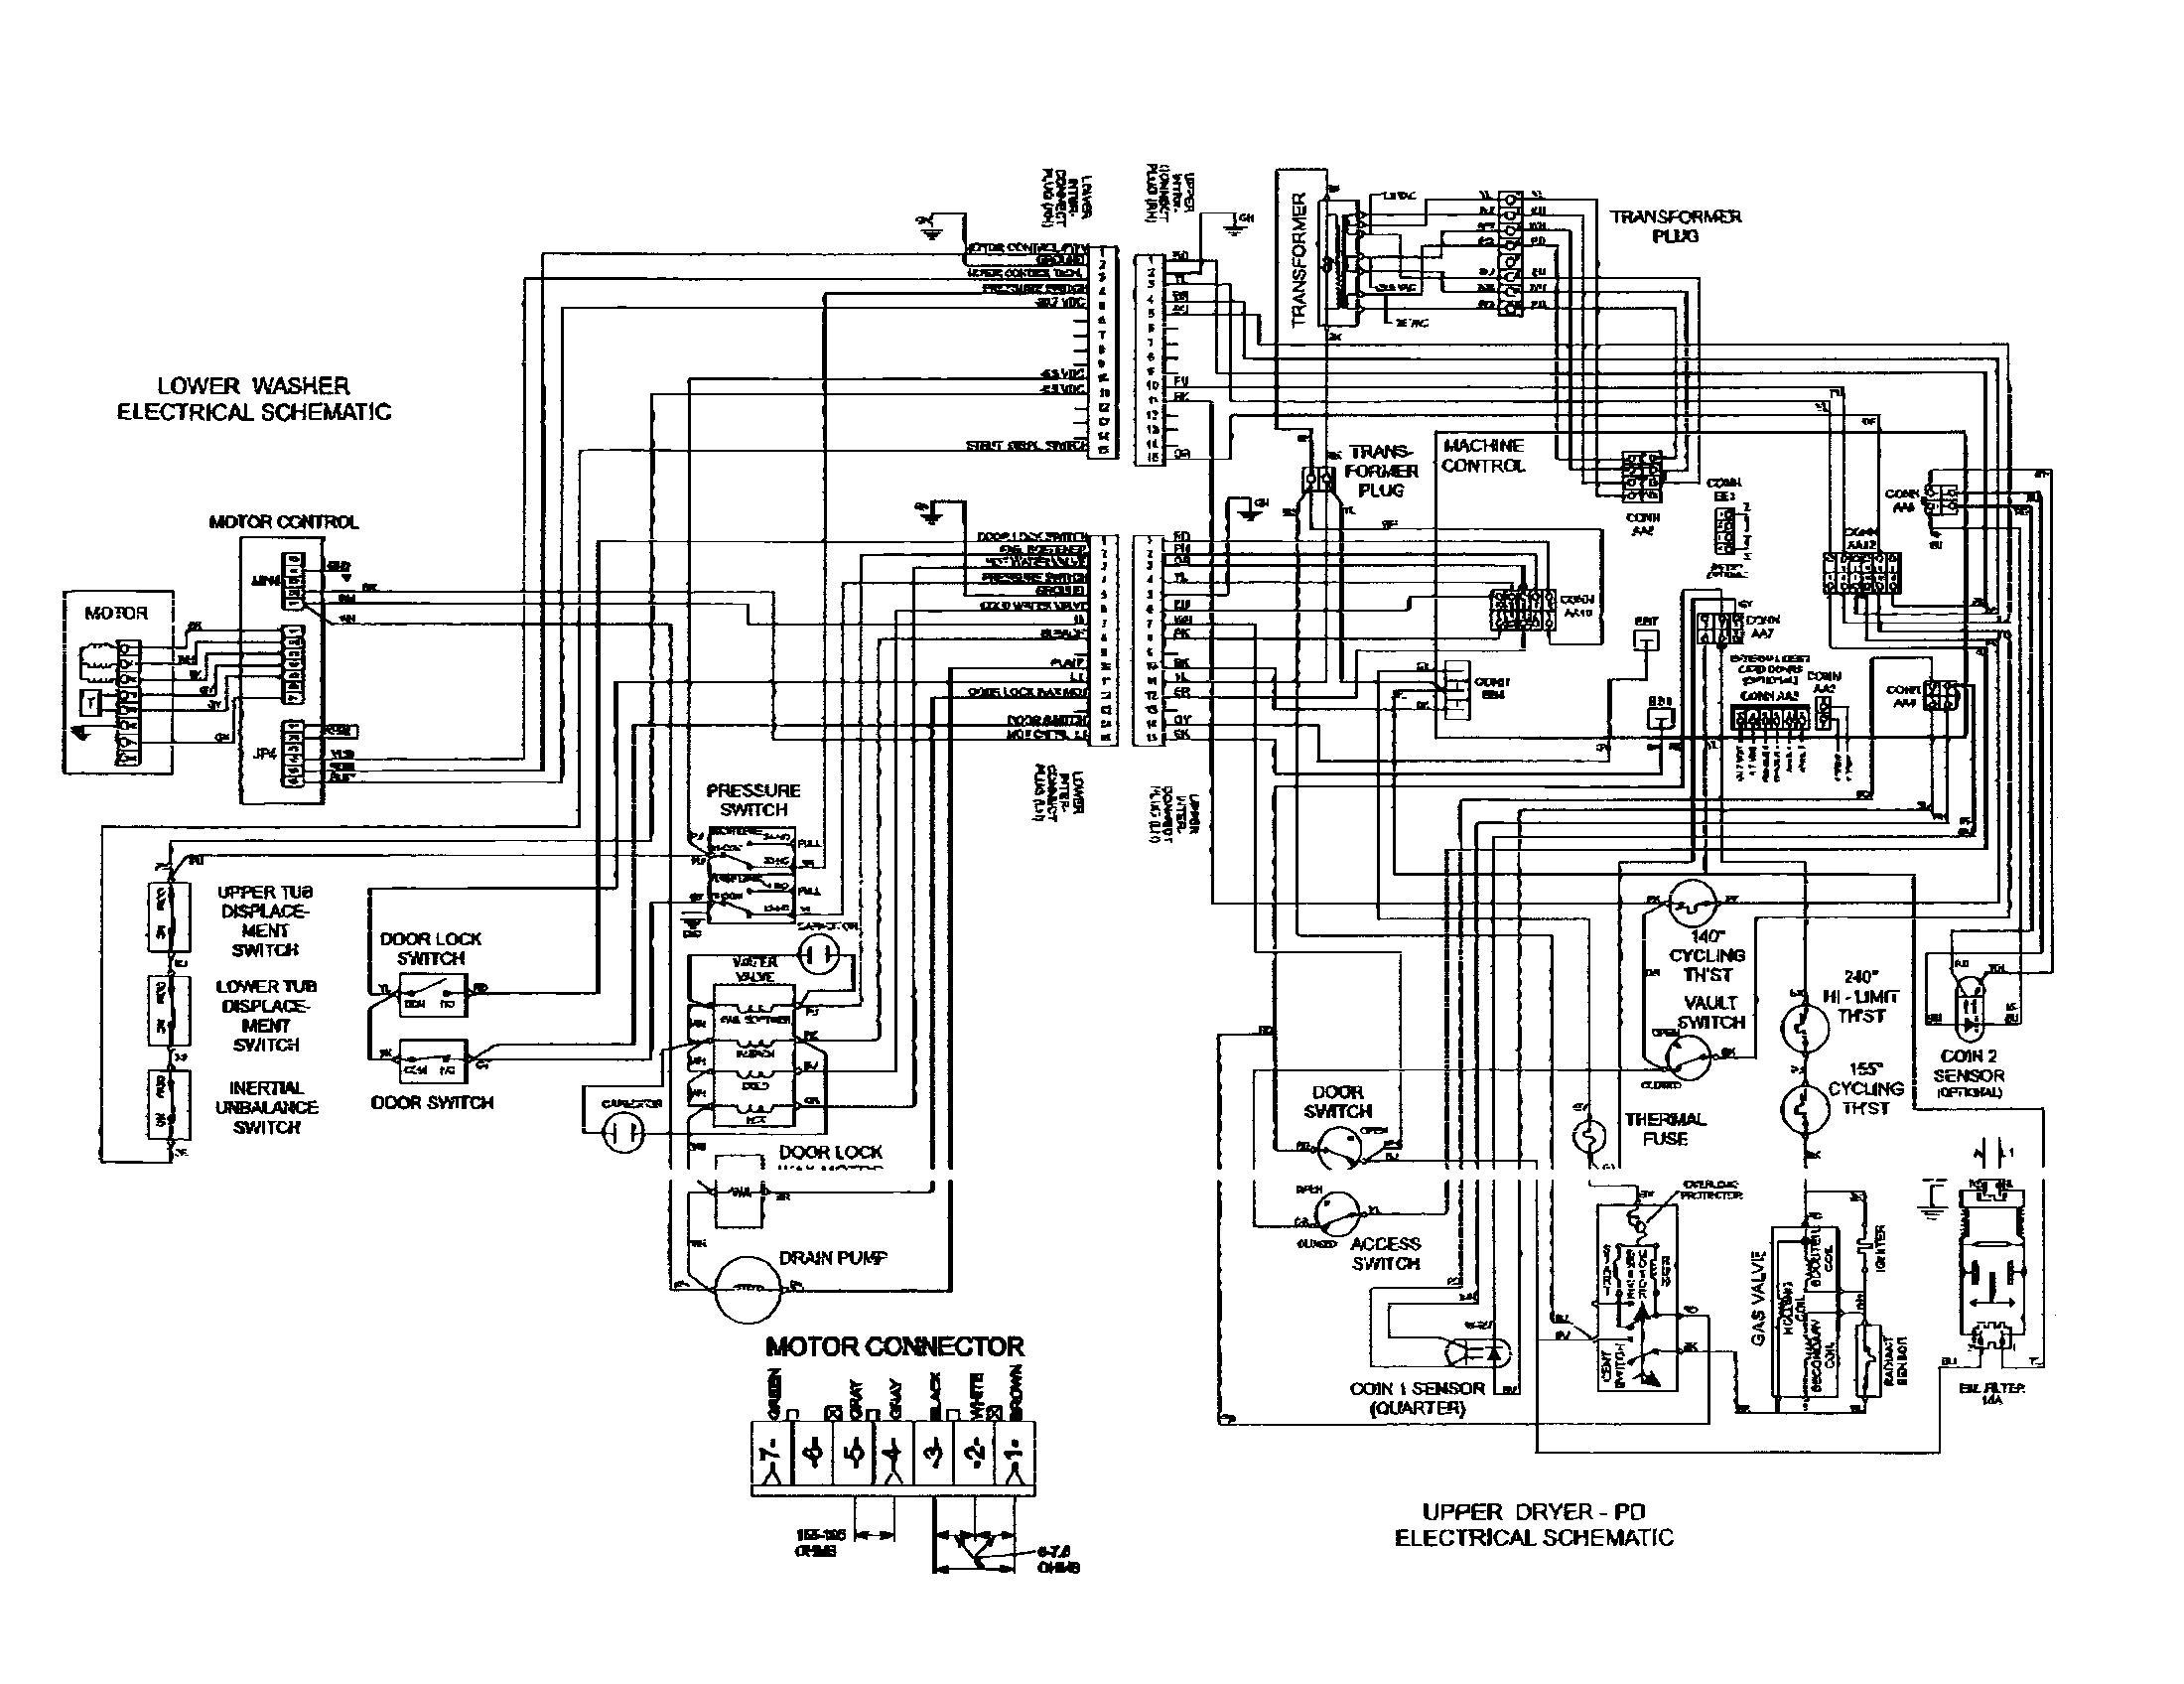 wiring diagram for maytag washing machine